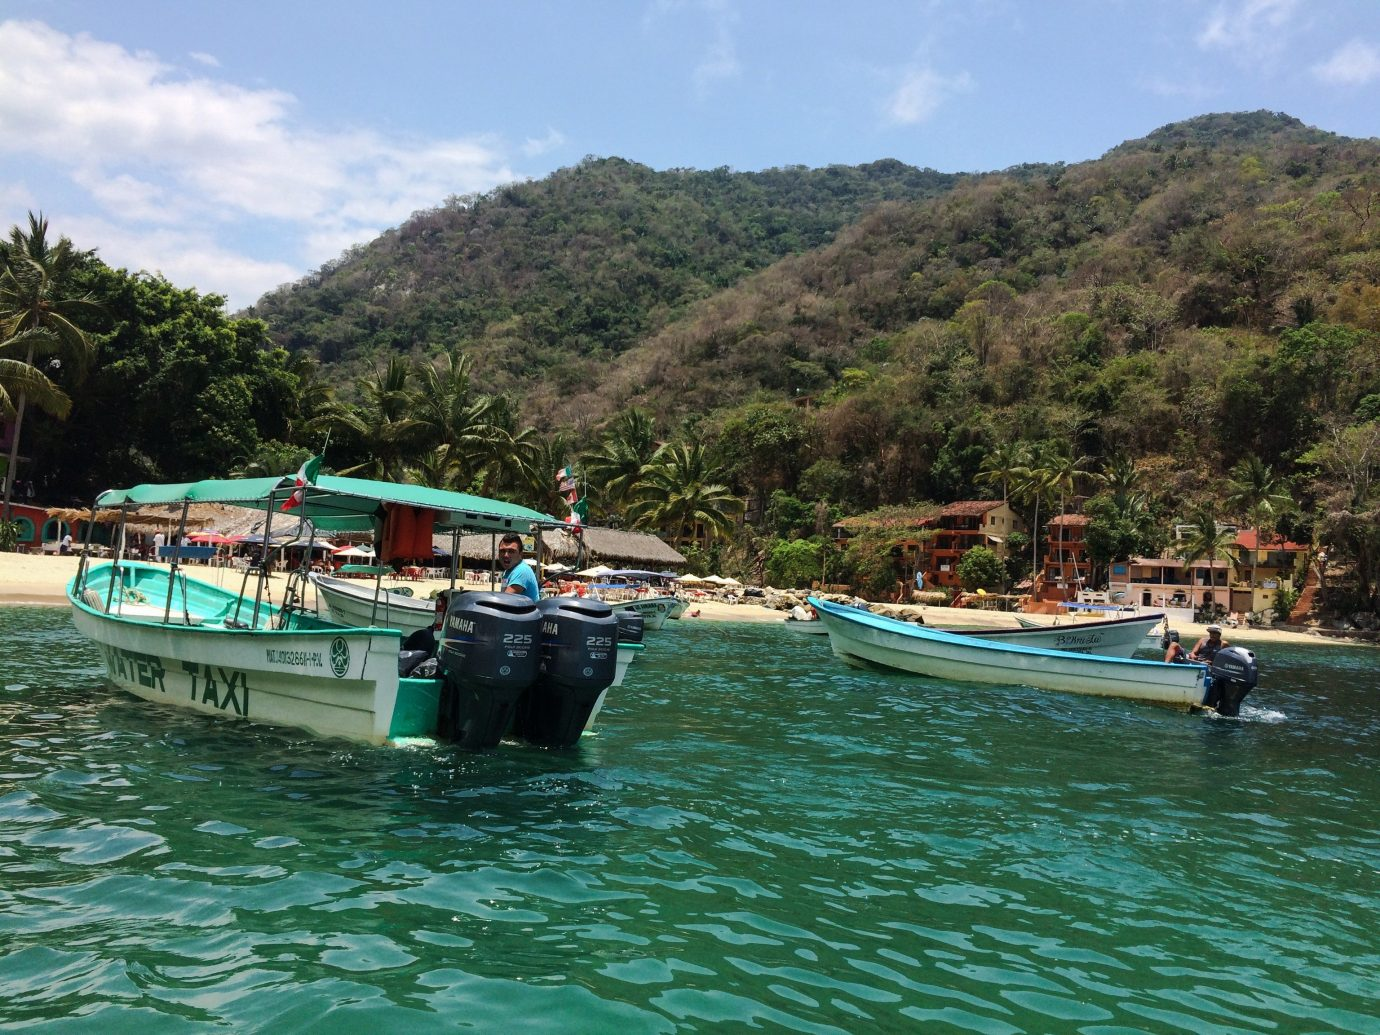 Travel Tips outdoor water sky Boat landform vehicle Sea mountain boating green vacation tourism bay River Island Coast Lagoon watercraft